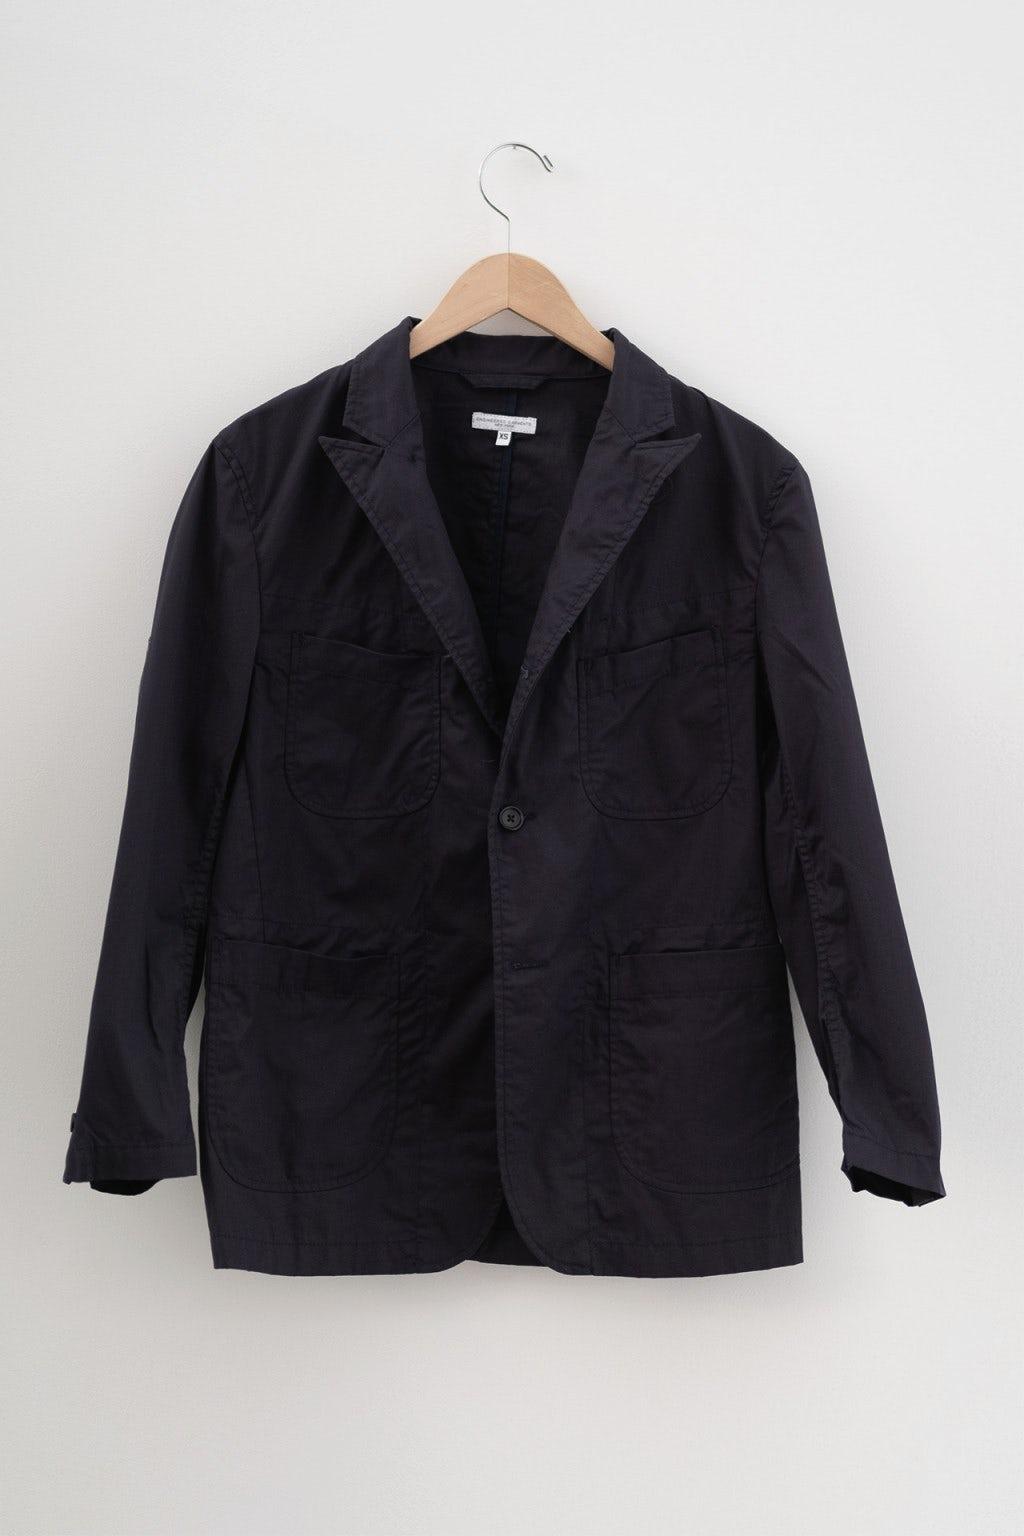 Engineered Garments Bedford Jacket Navy 6.5oz Flat Twill